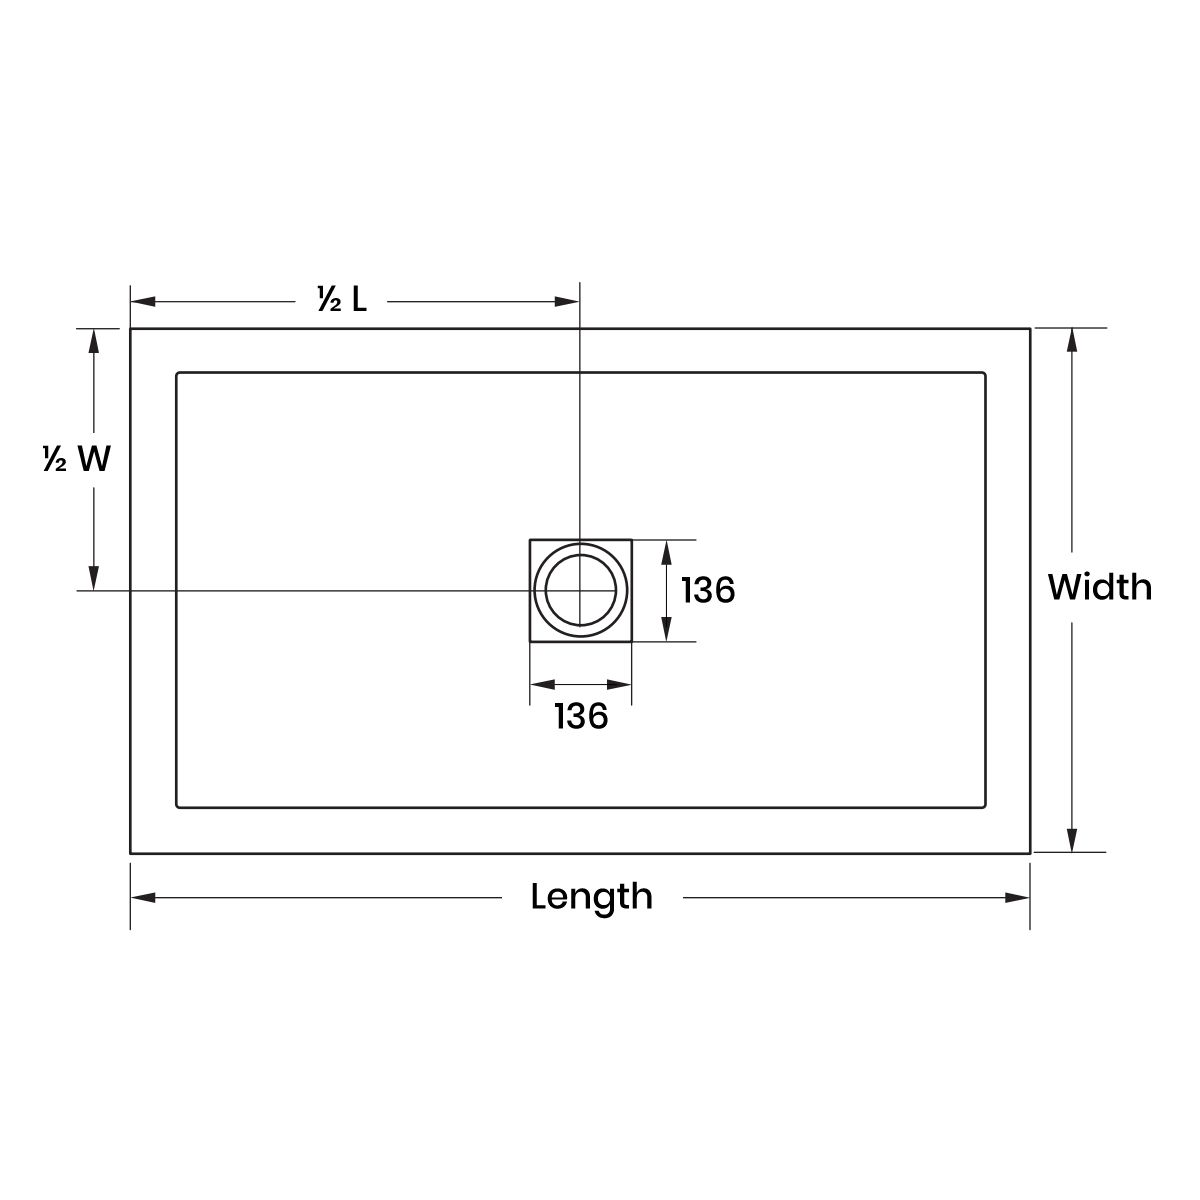 Aquadart White Slate Shower Tray 1200 x 760 Dimension